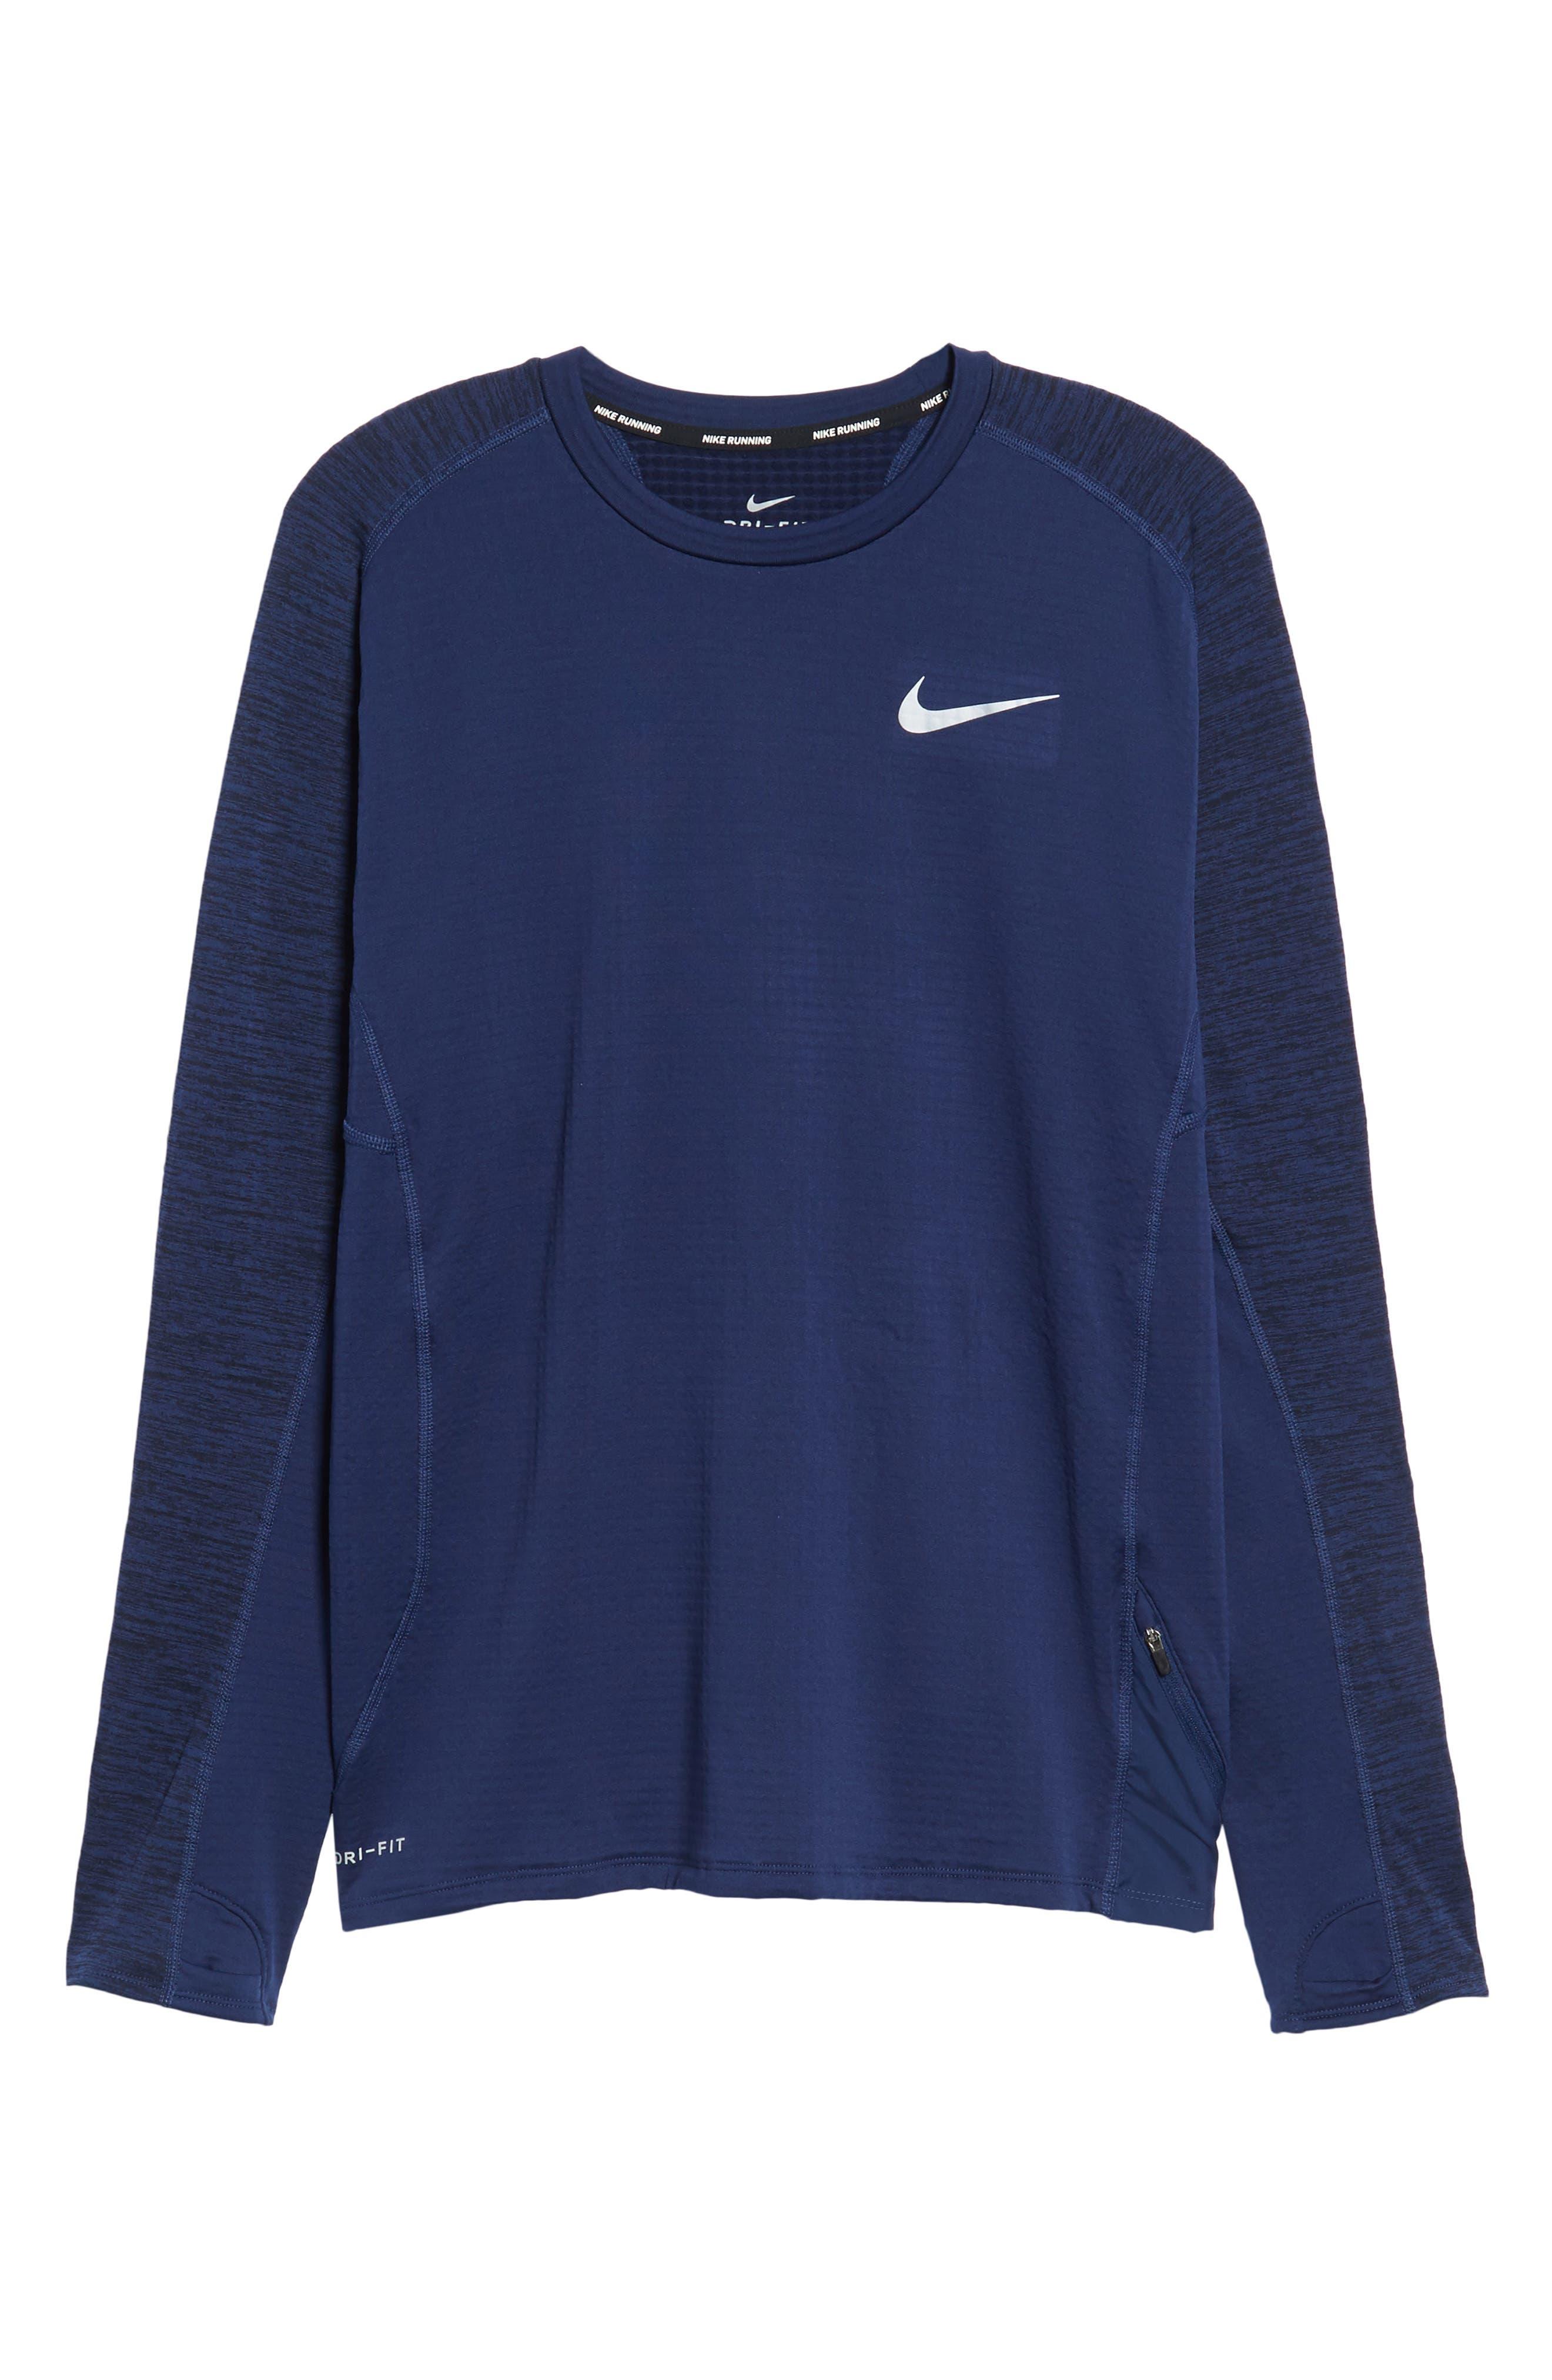 ThermaSphere Long Sleeve Running T-Shirt,                             Alternate thumbnail 10, color,                             Binary Blue/ Purple/ Heather